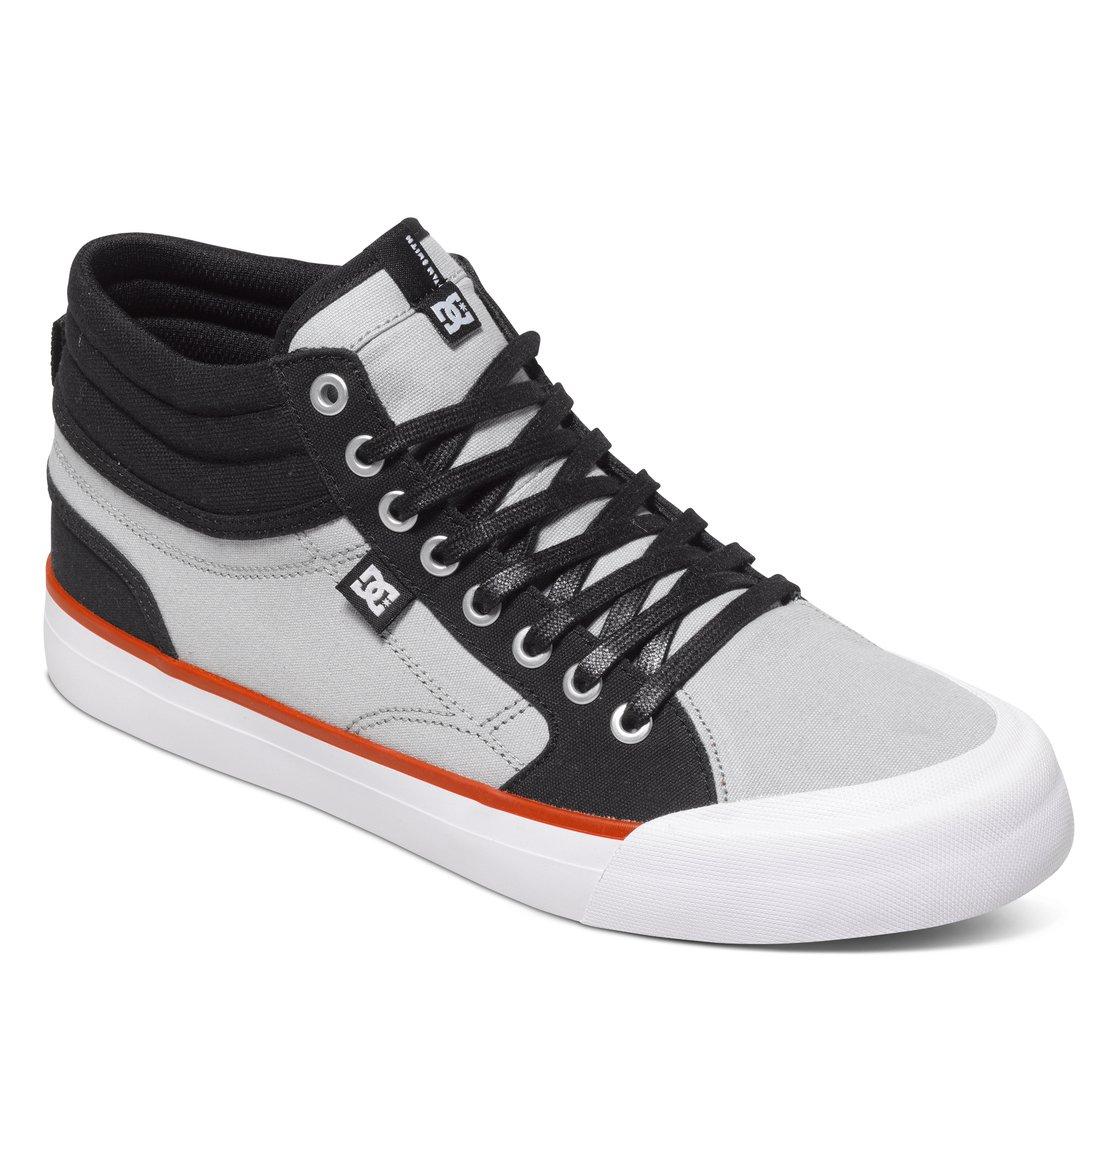 Evan Smith Hi - High-Top Shoes for Men